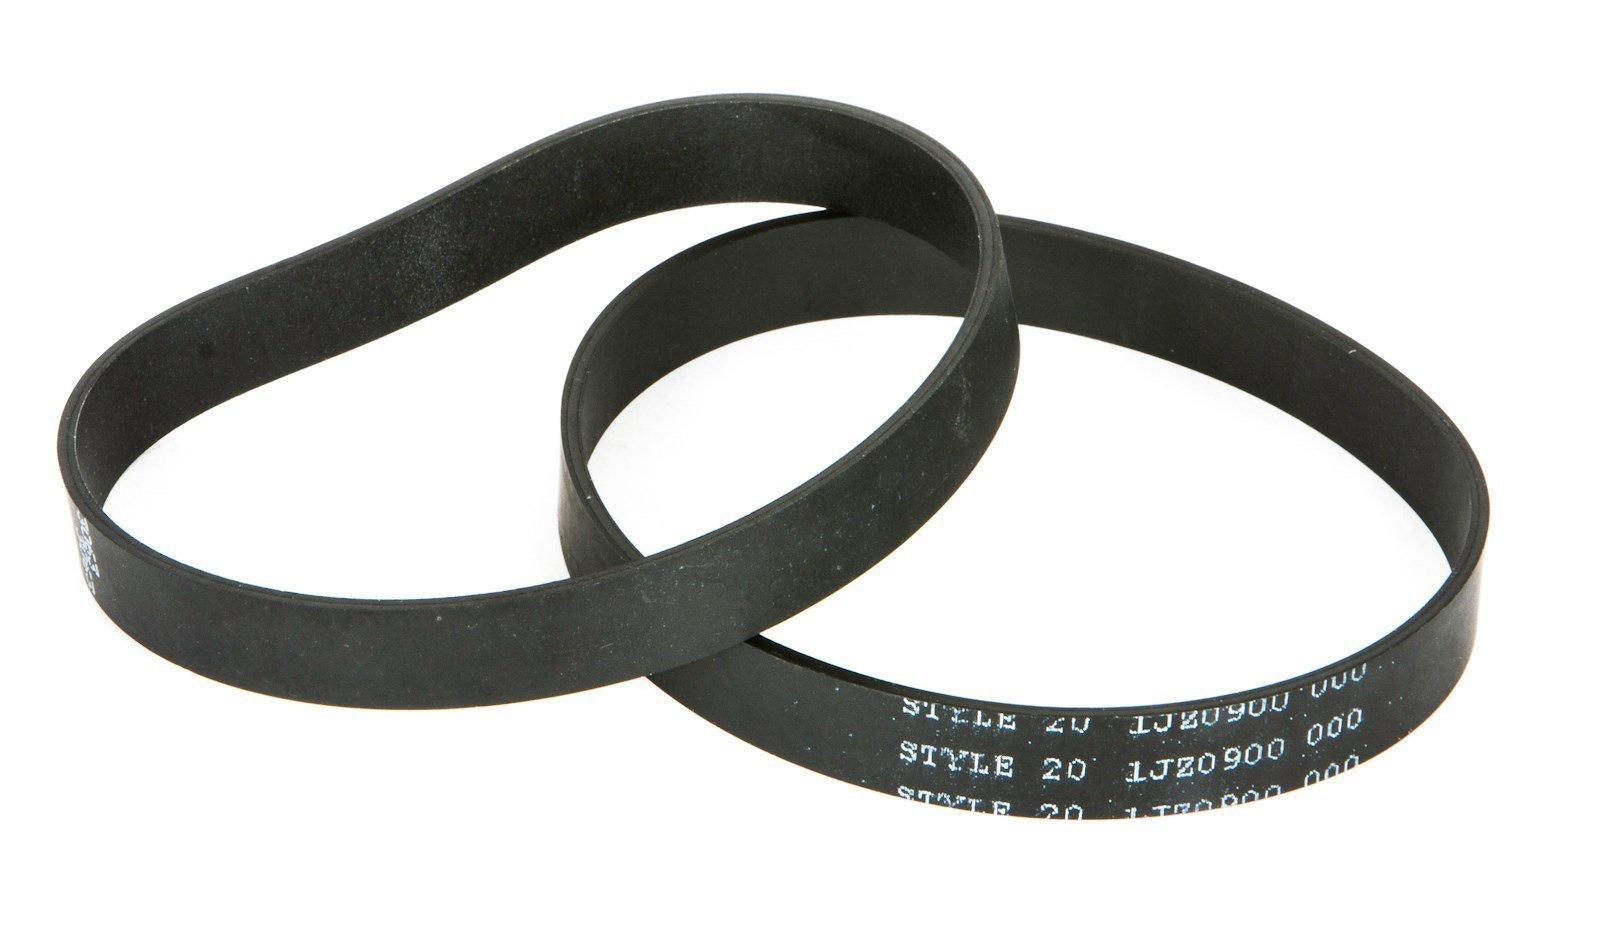 Belt Style 20 - 2 pack1